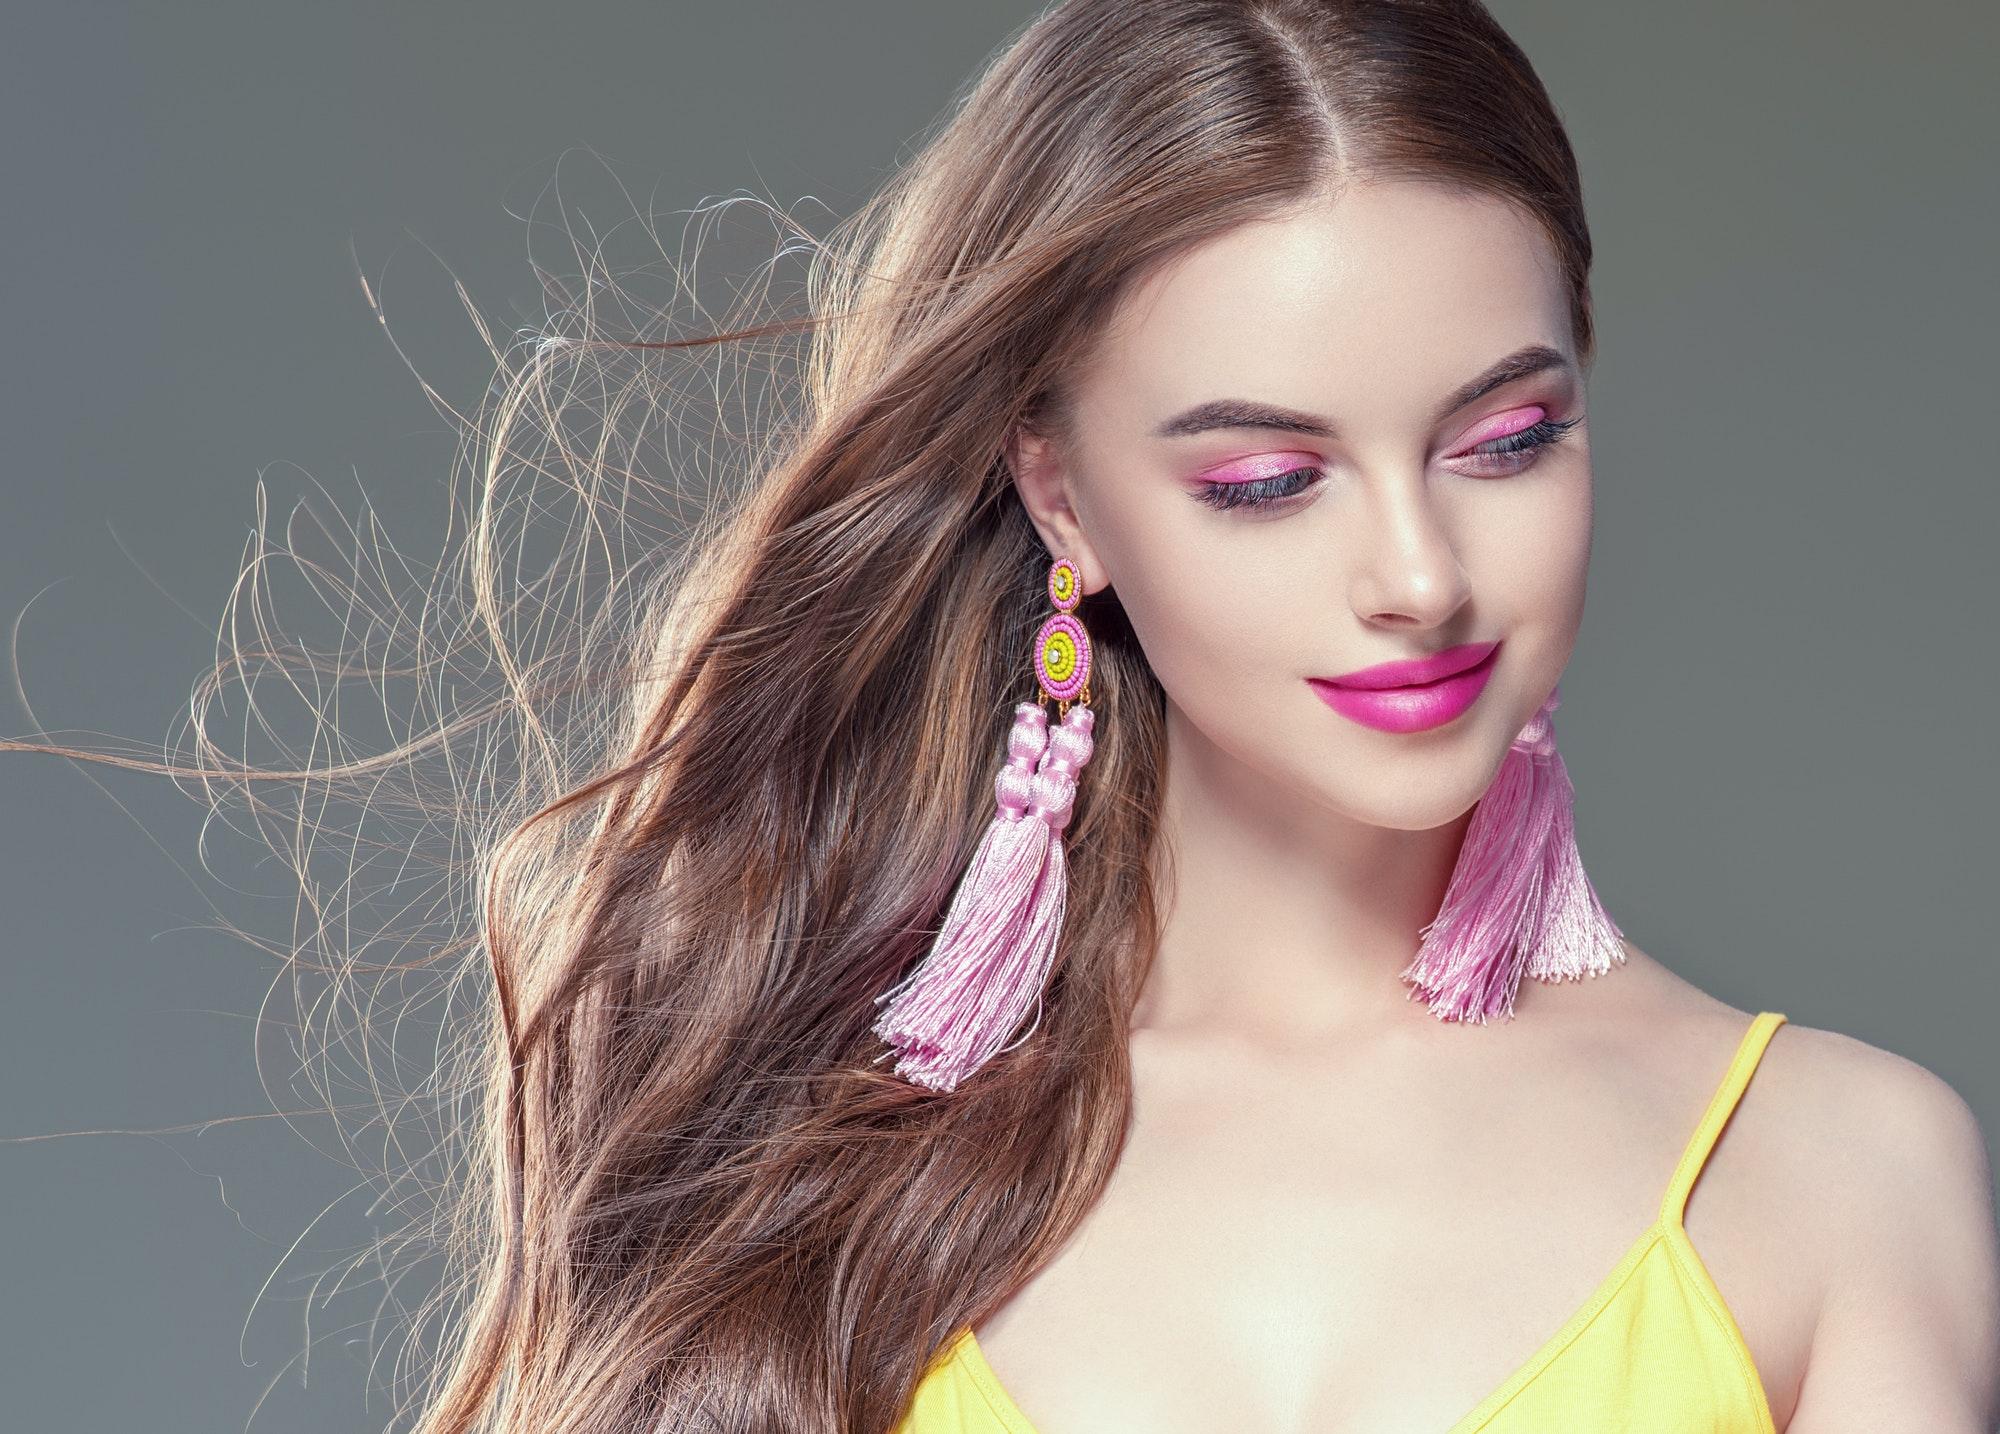 Female beauty portrait long hairstyle